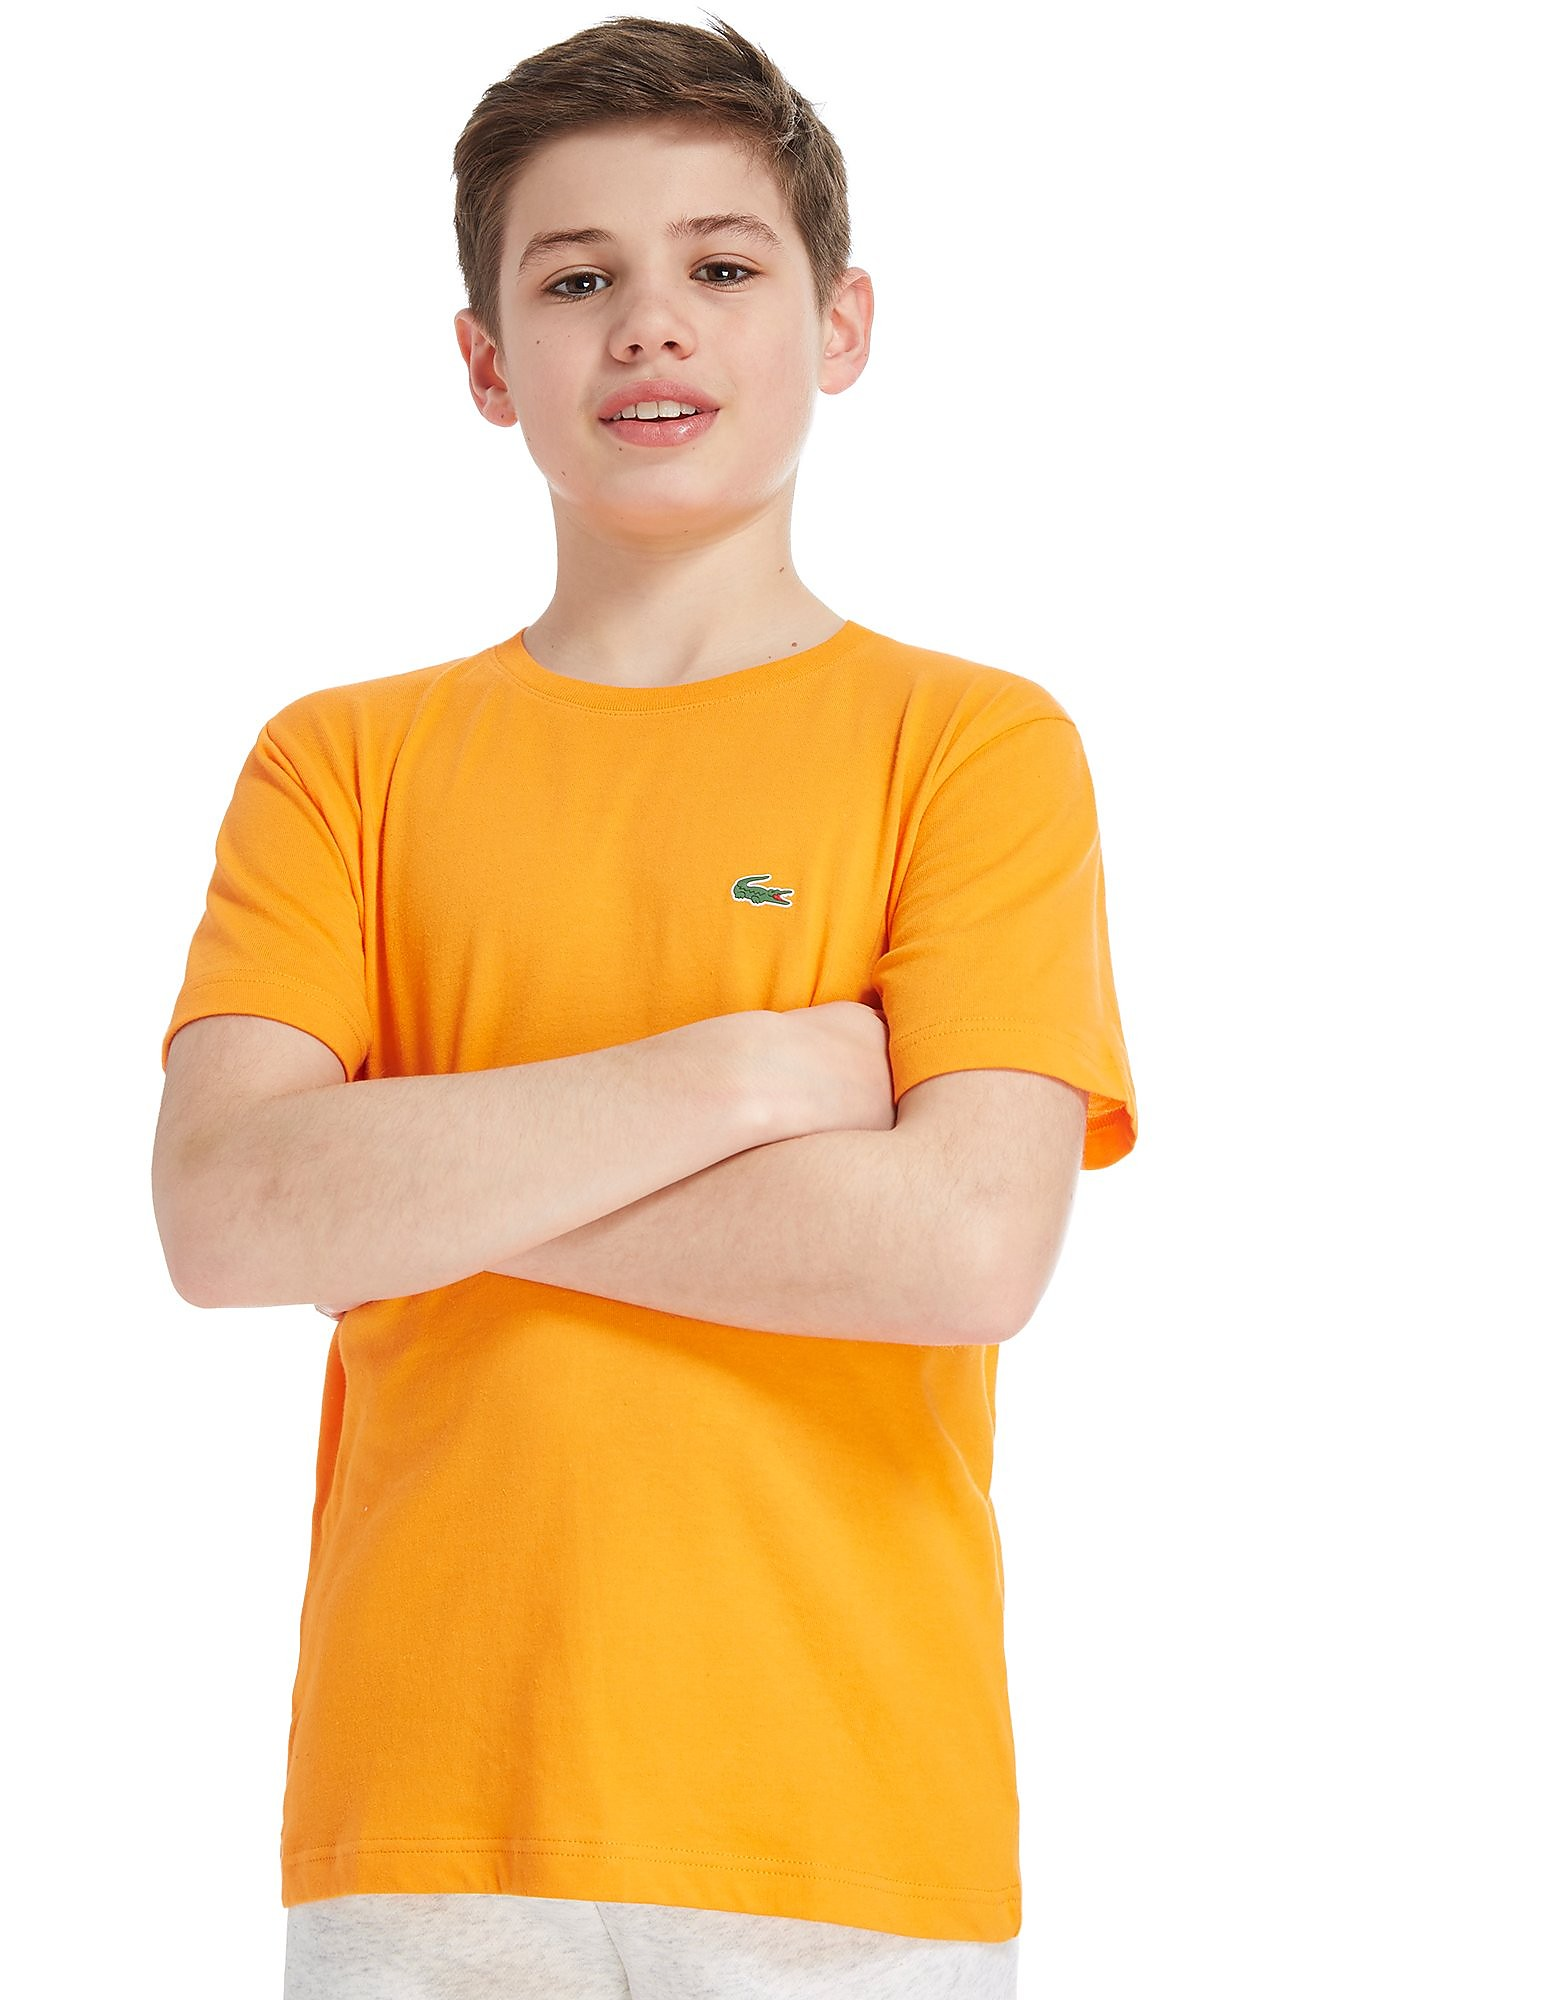 Lacoste Small Logo T-Shirt Junior - Oranje - Kind